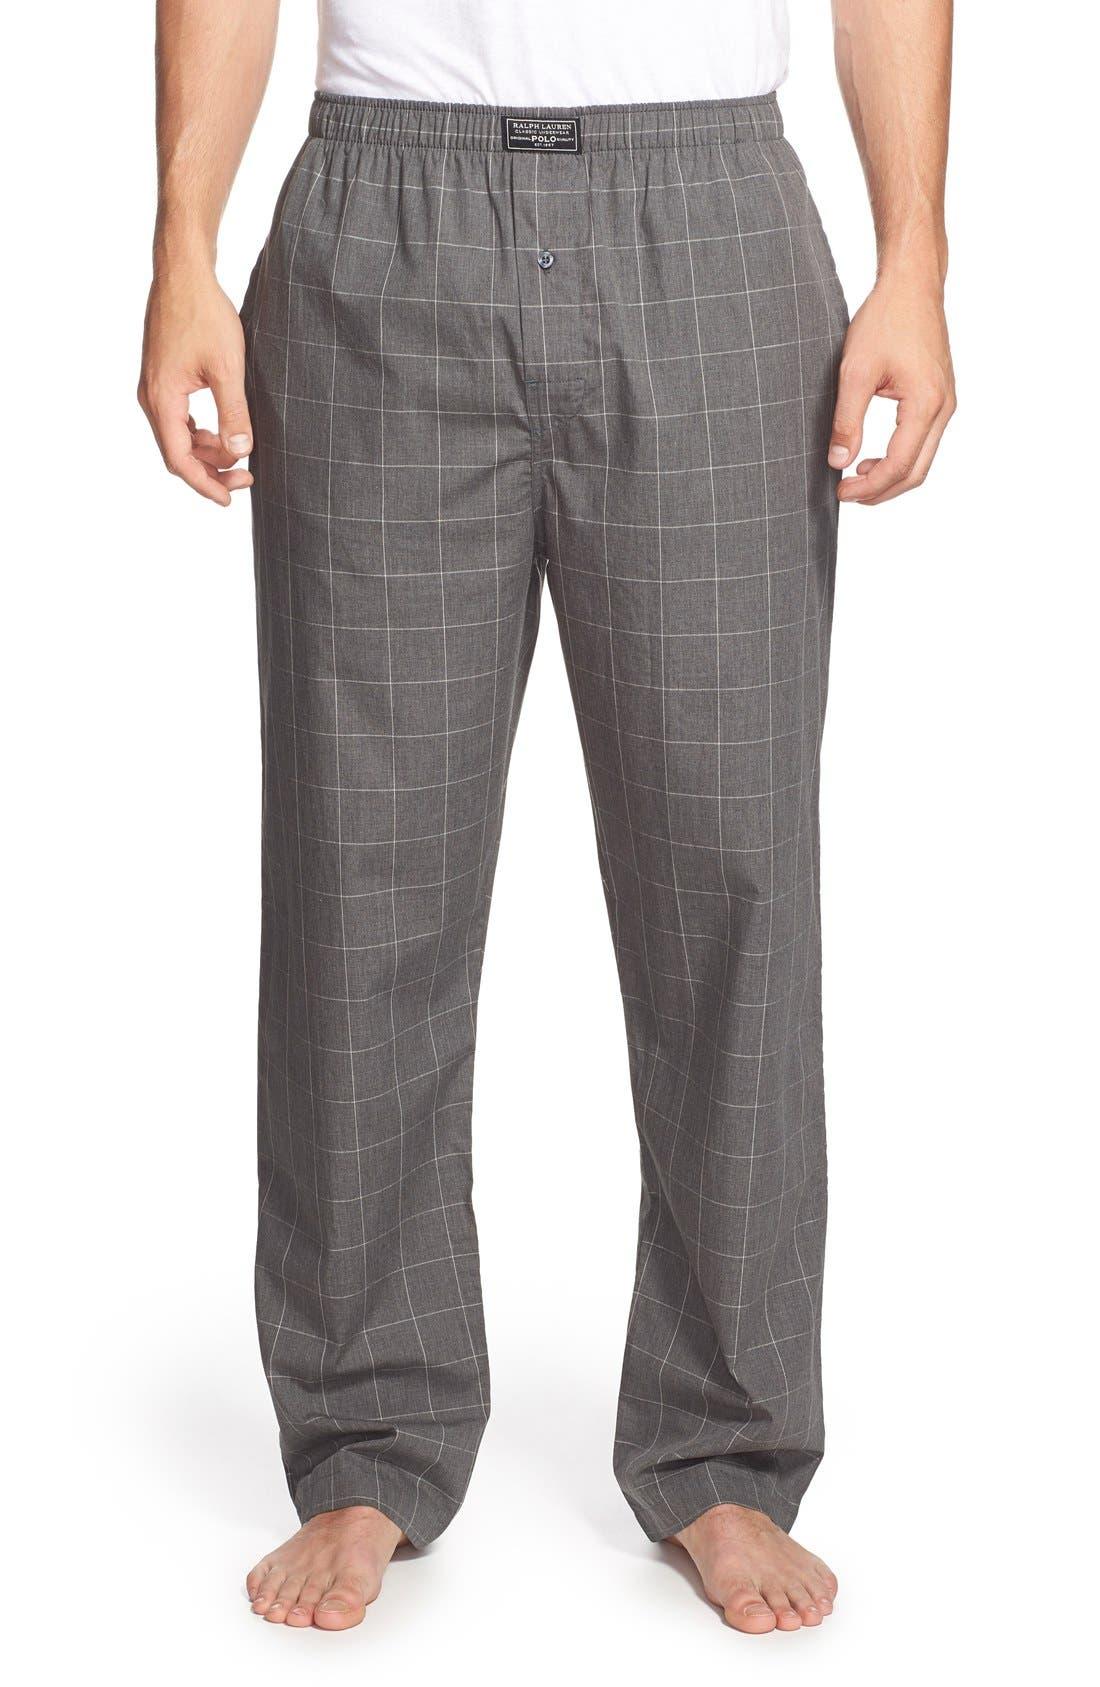 POLO RALPH LAUREN, Cotton Pajama Pants, Main thumbnail 1, color, CHARCOAL